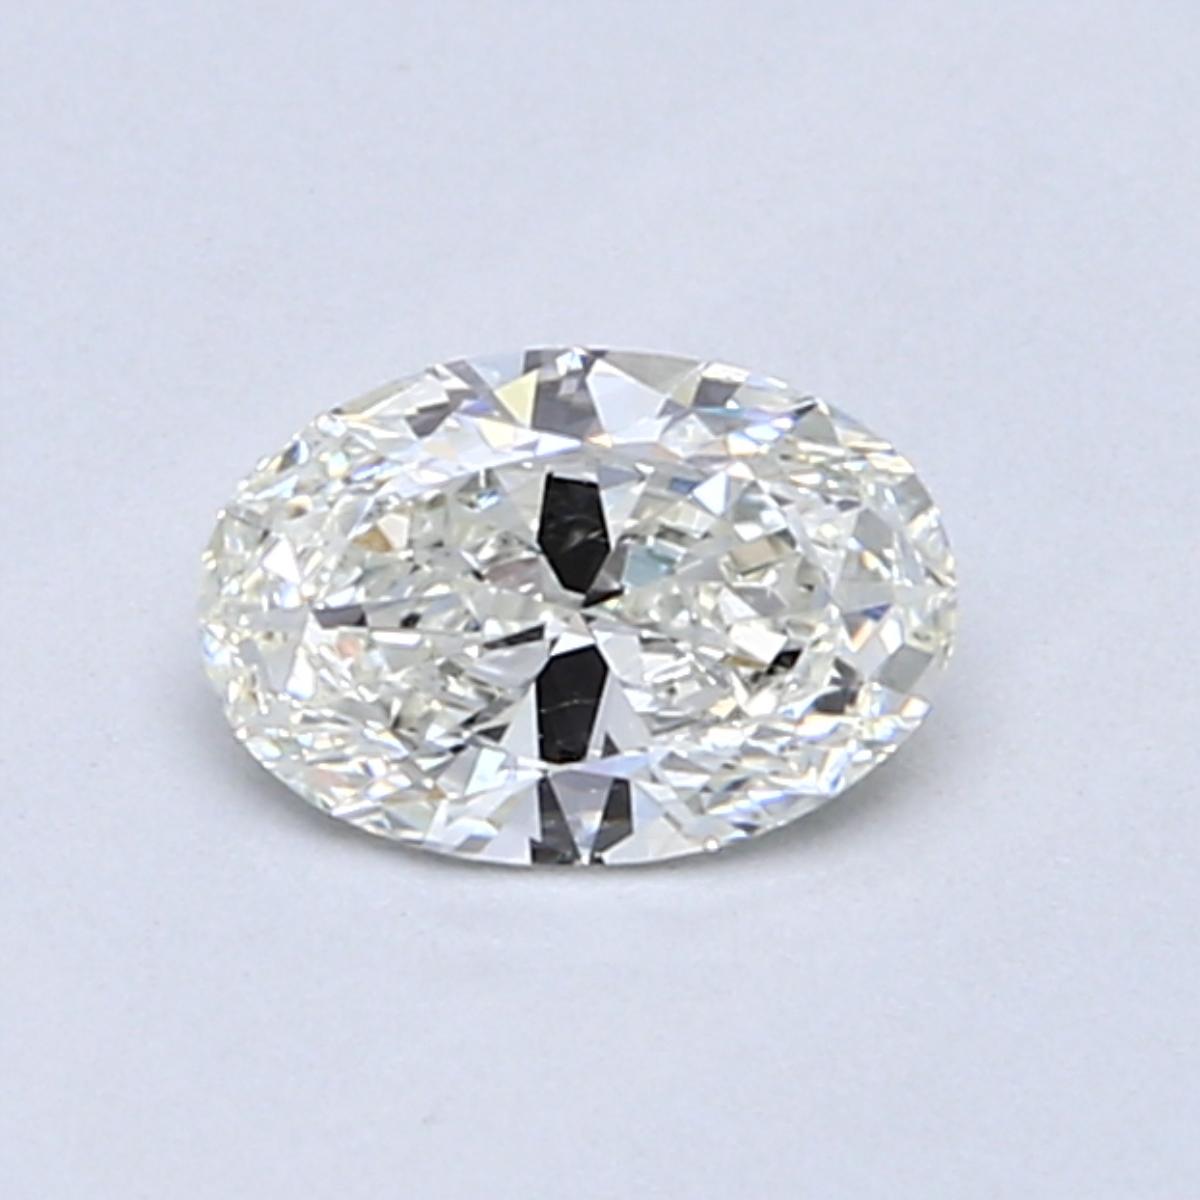 0.51 Carat I SI1 Oval Diamond